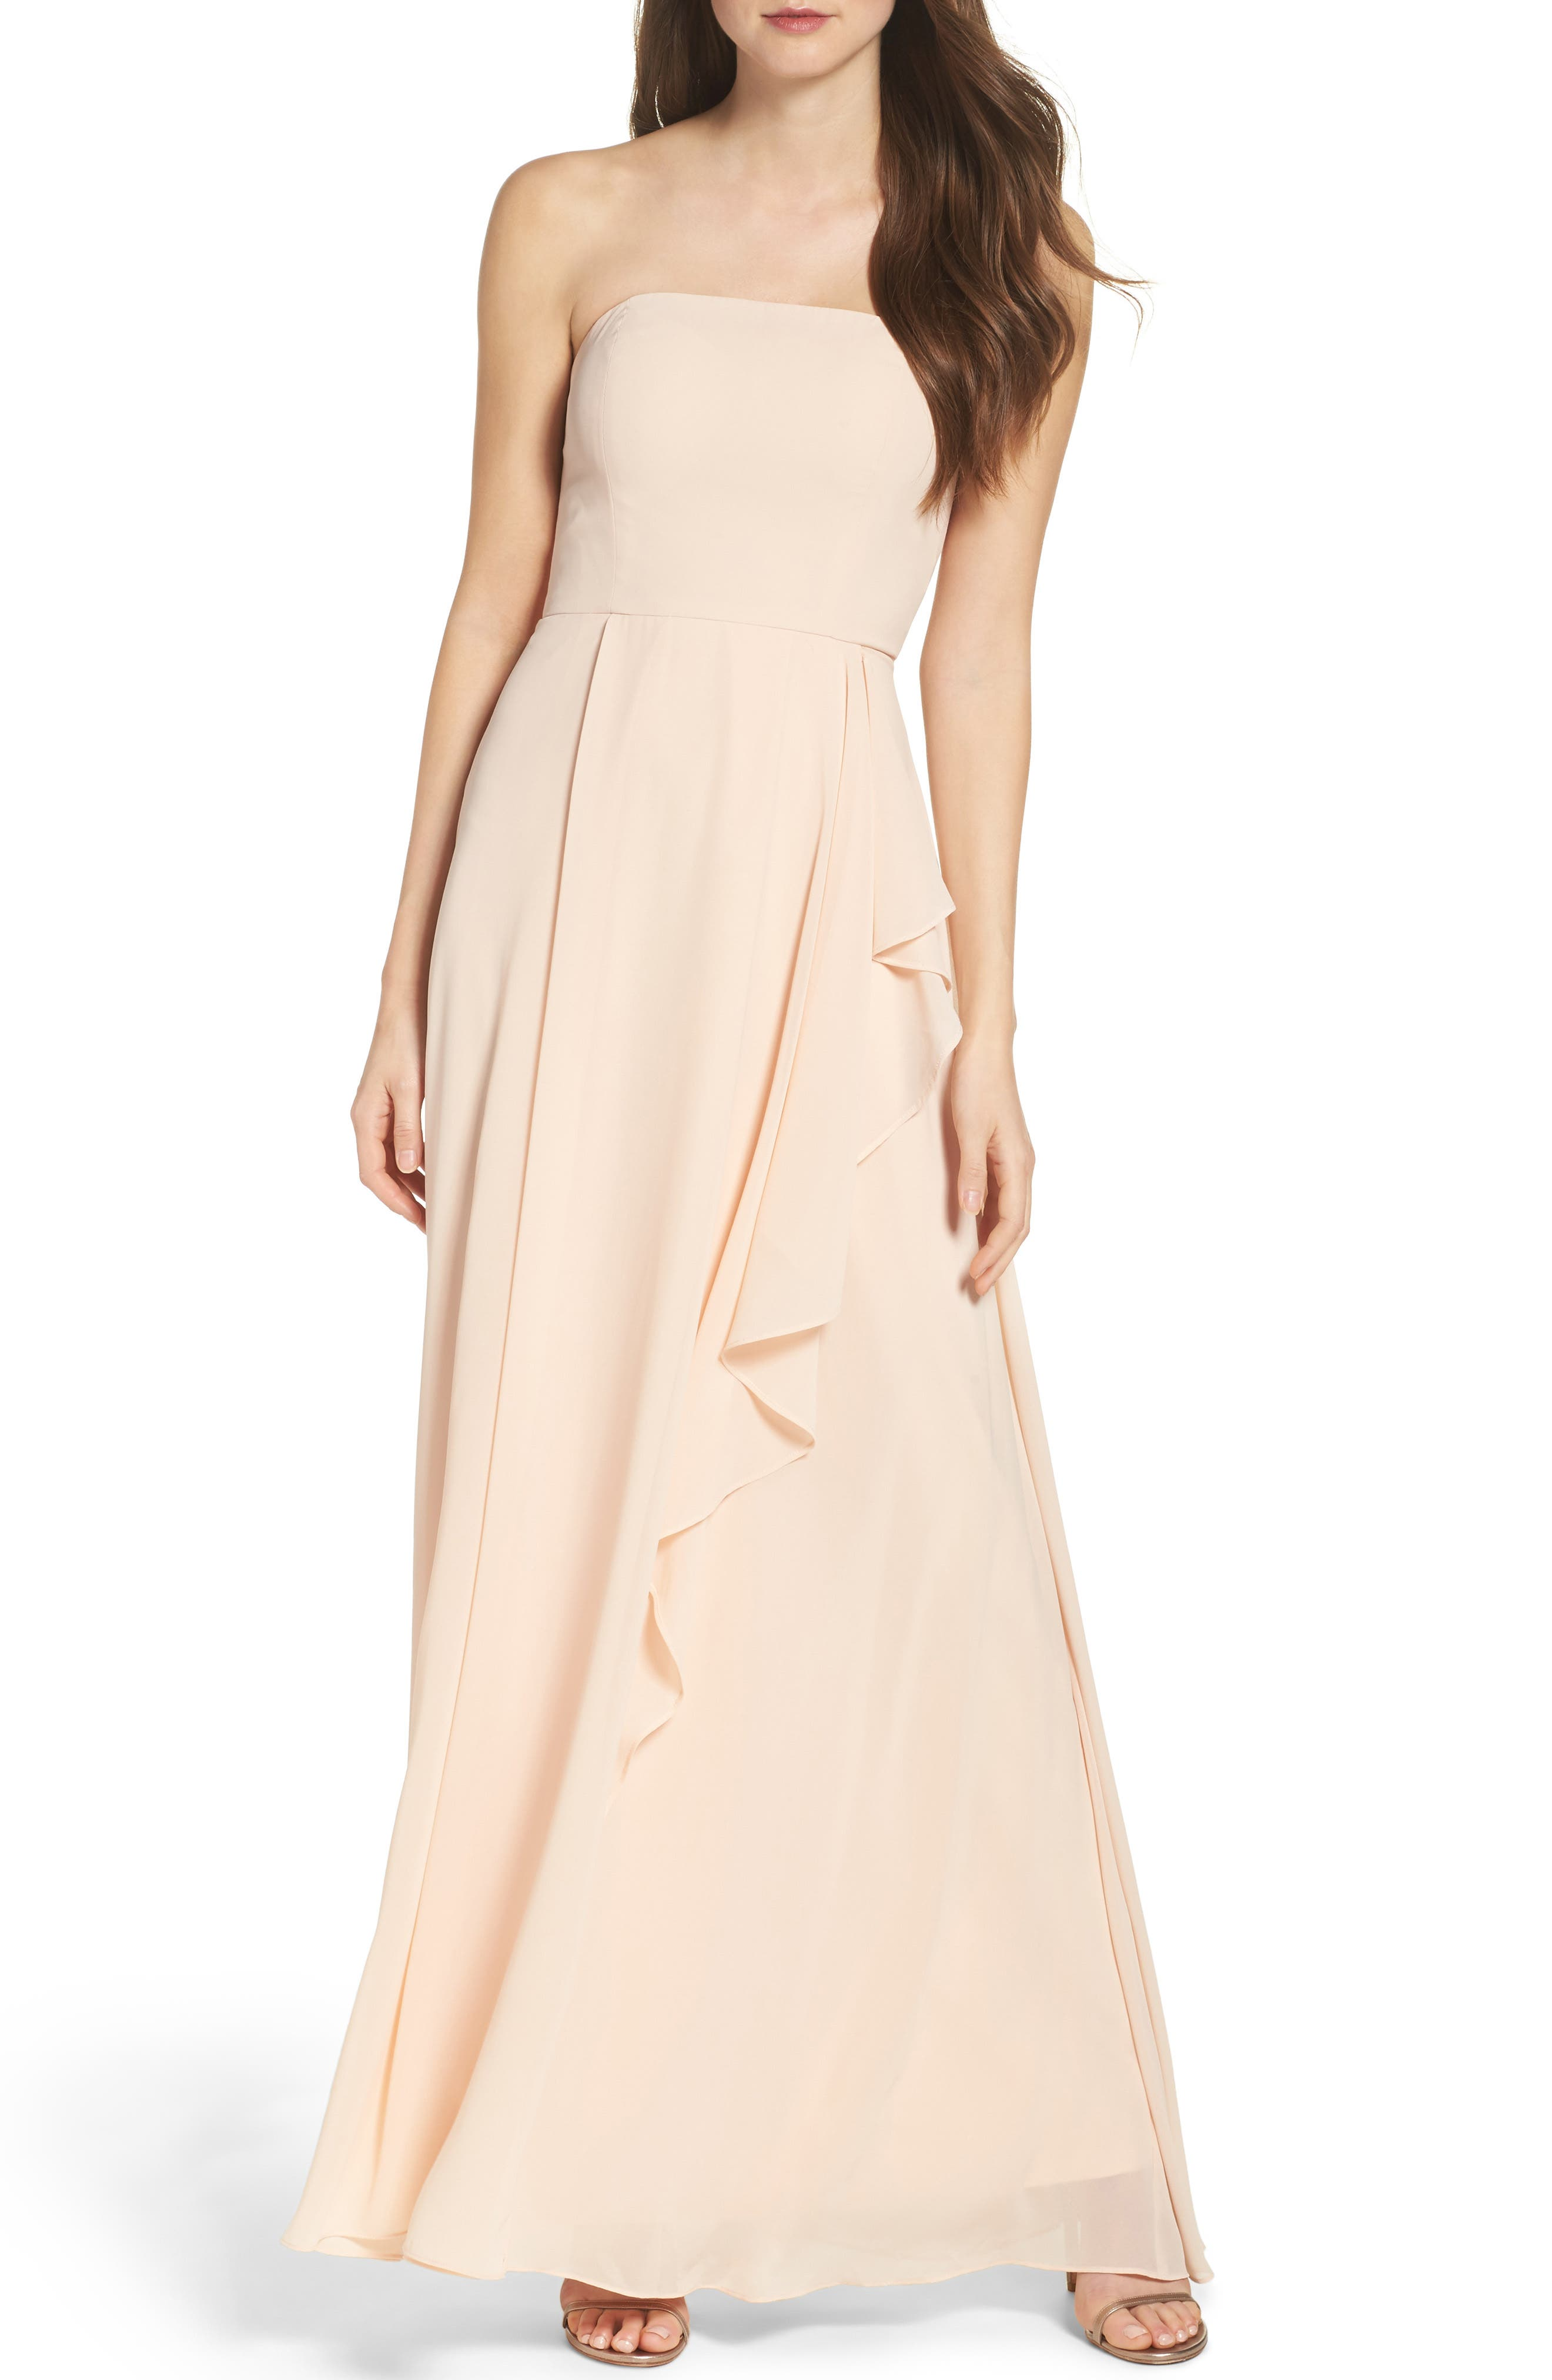 Alternate Image 1 Selected - Lulus Chiffon Strapless Maxi Dress